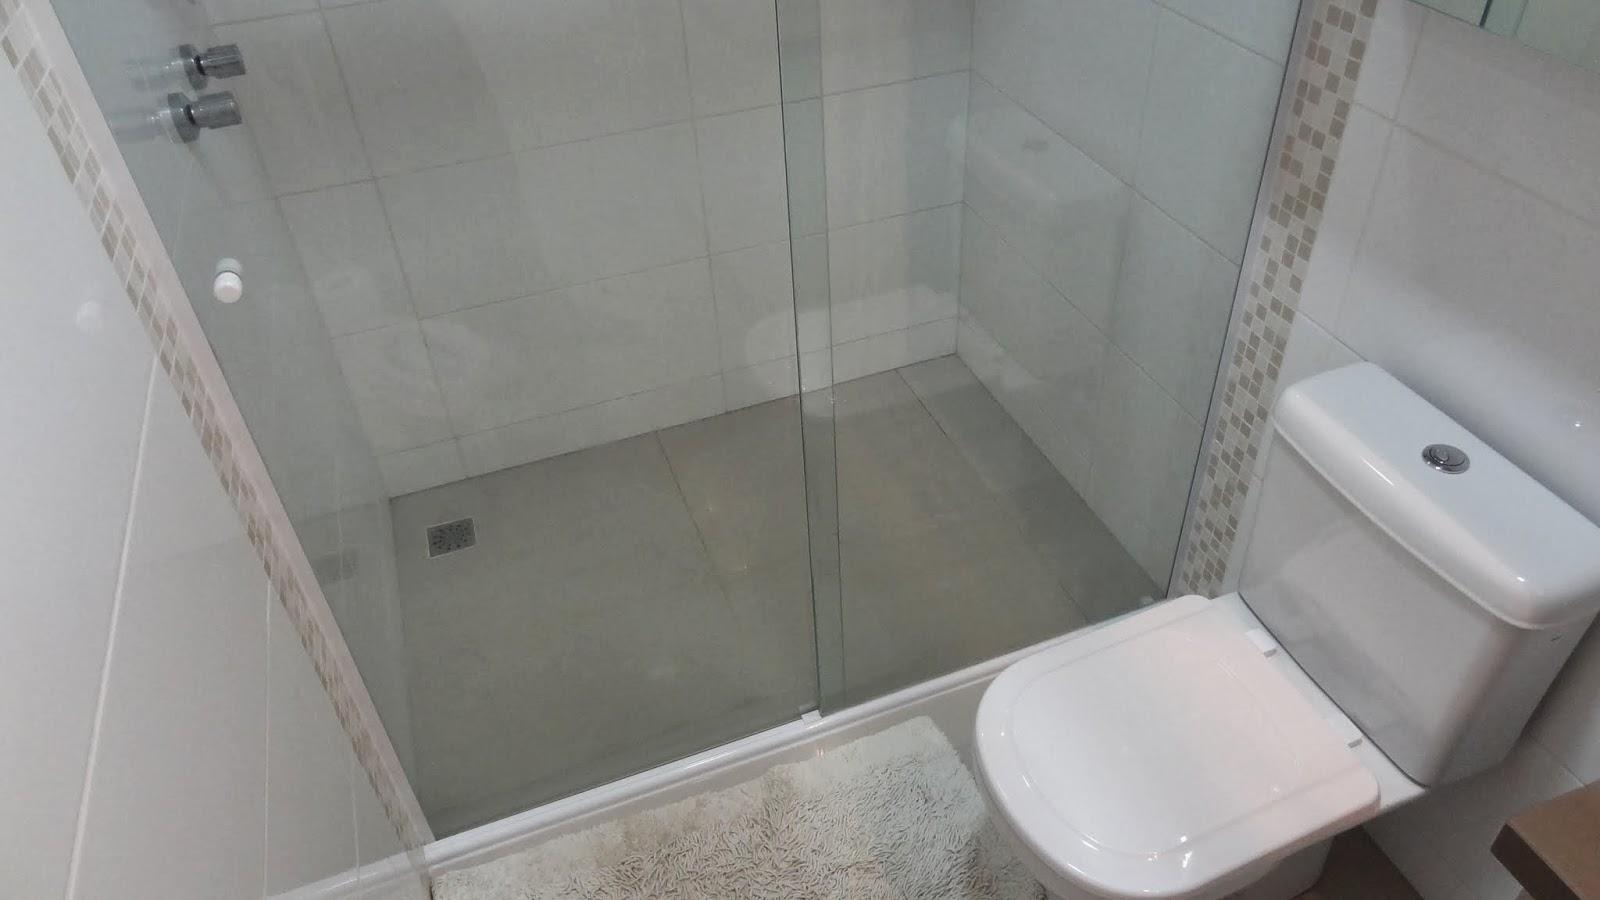 ao acabamento: Lavabo Social e Banheiro da Suíte Casal Reta final #605149 1600x900 Acessorios Banheiro Perflex